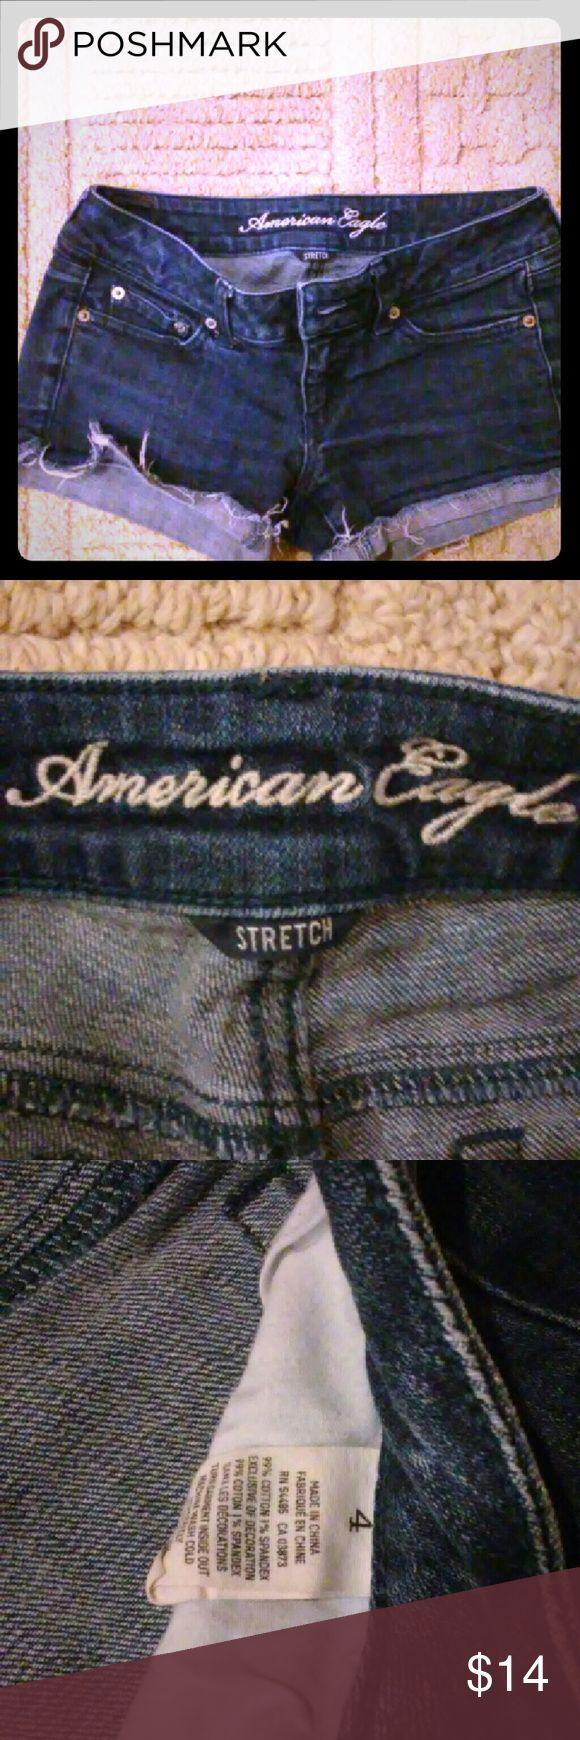 American Eagle cut off jean shorts Size 4 cut off jean shorts. Barely worn. American Eagle Outfitters Shorts Jean Shorts